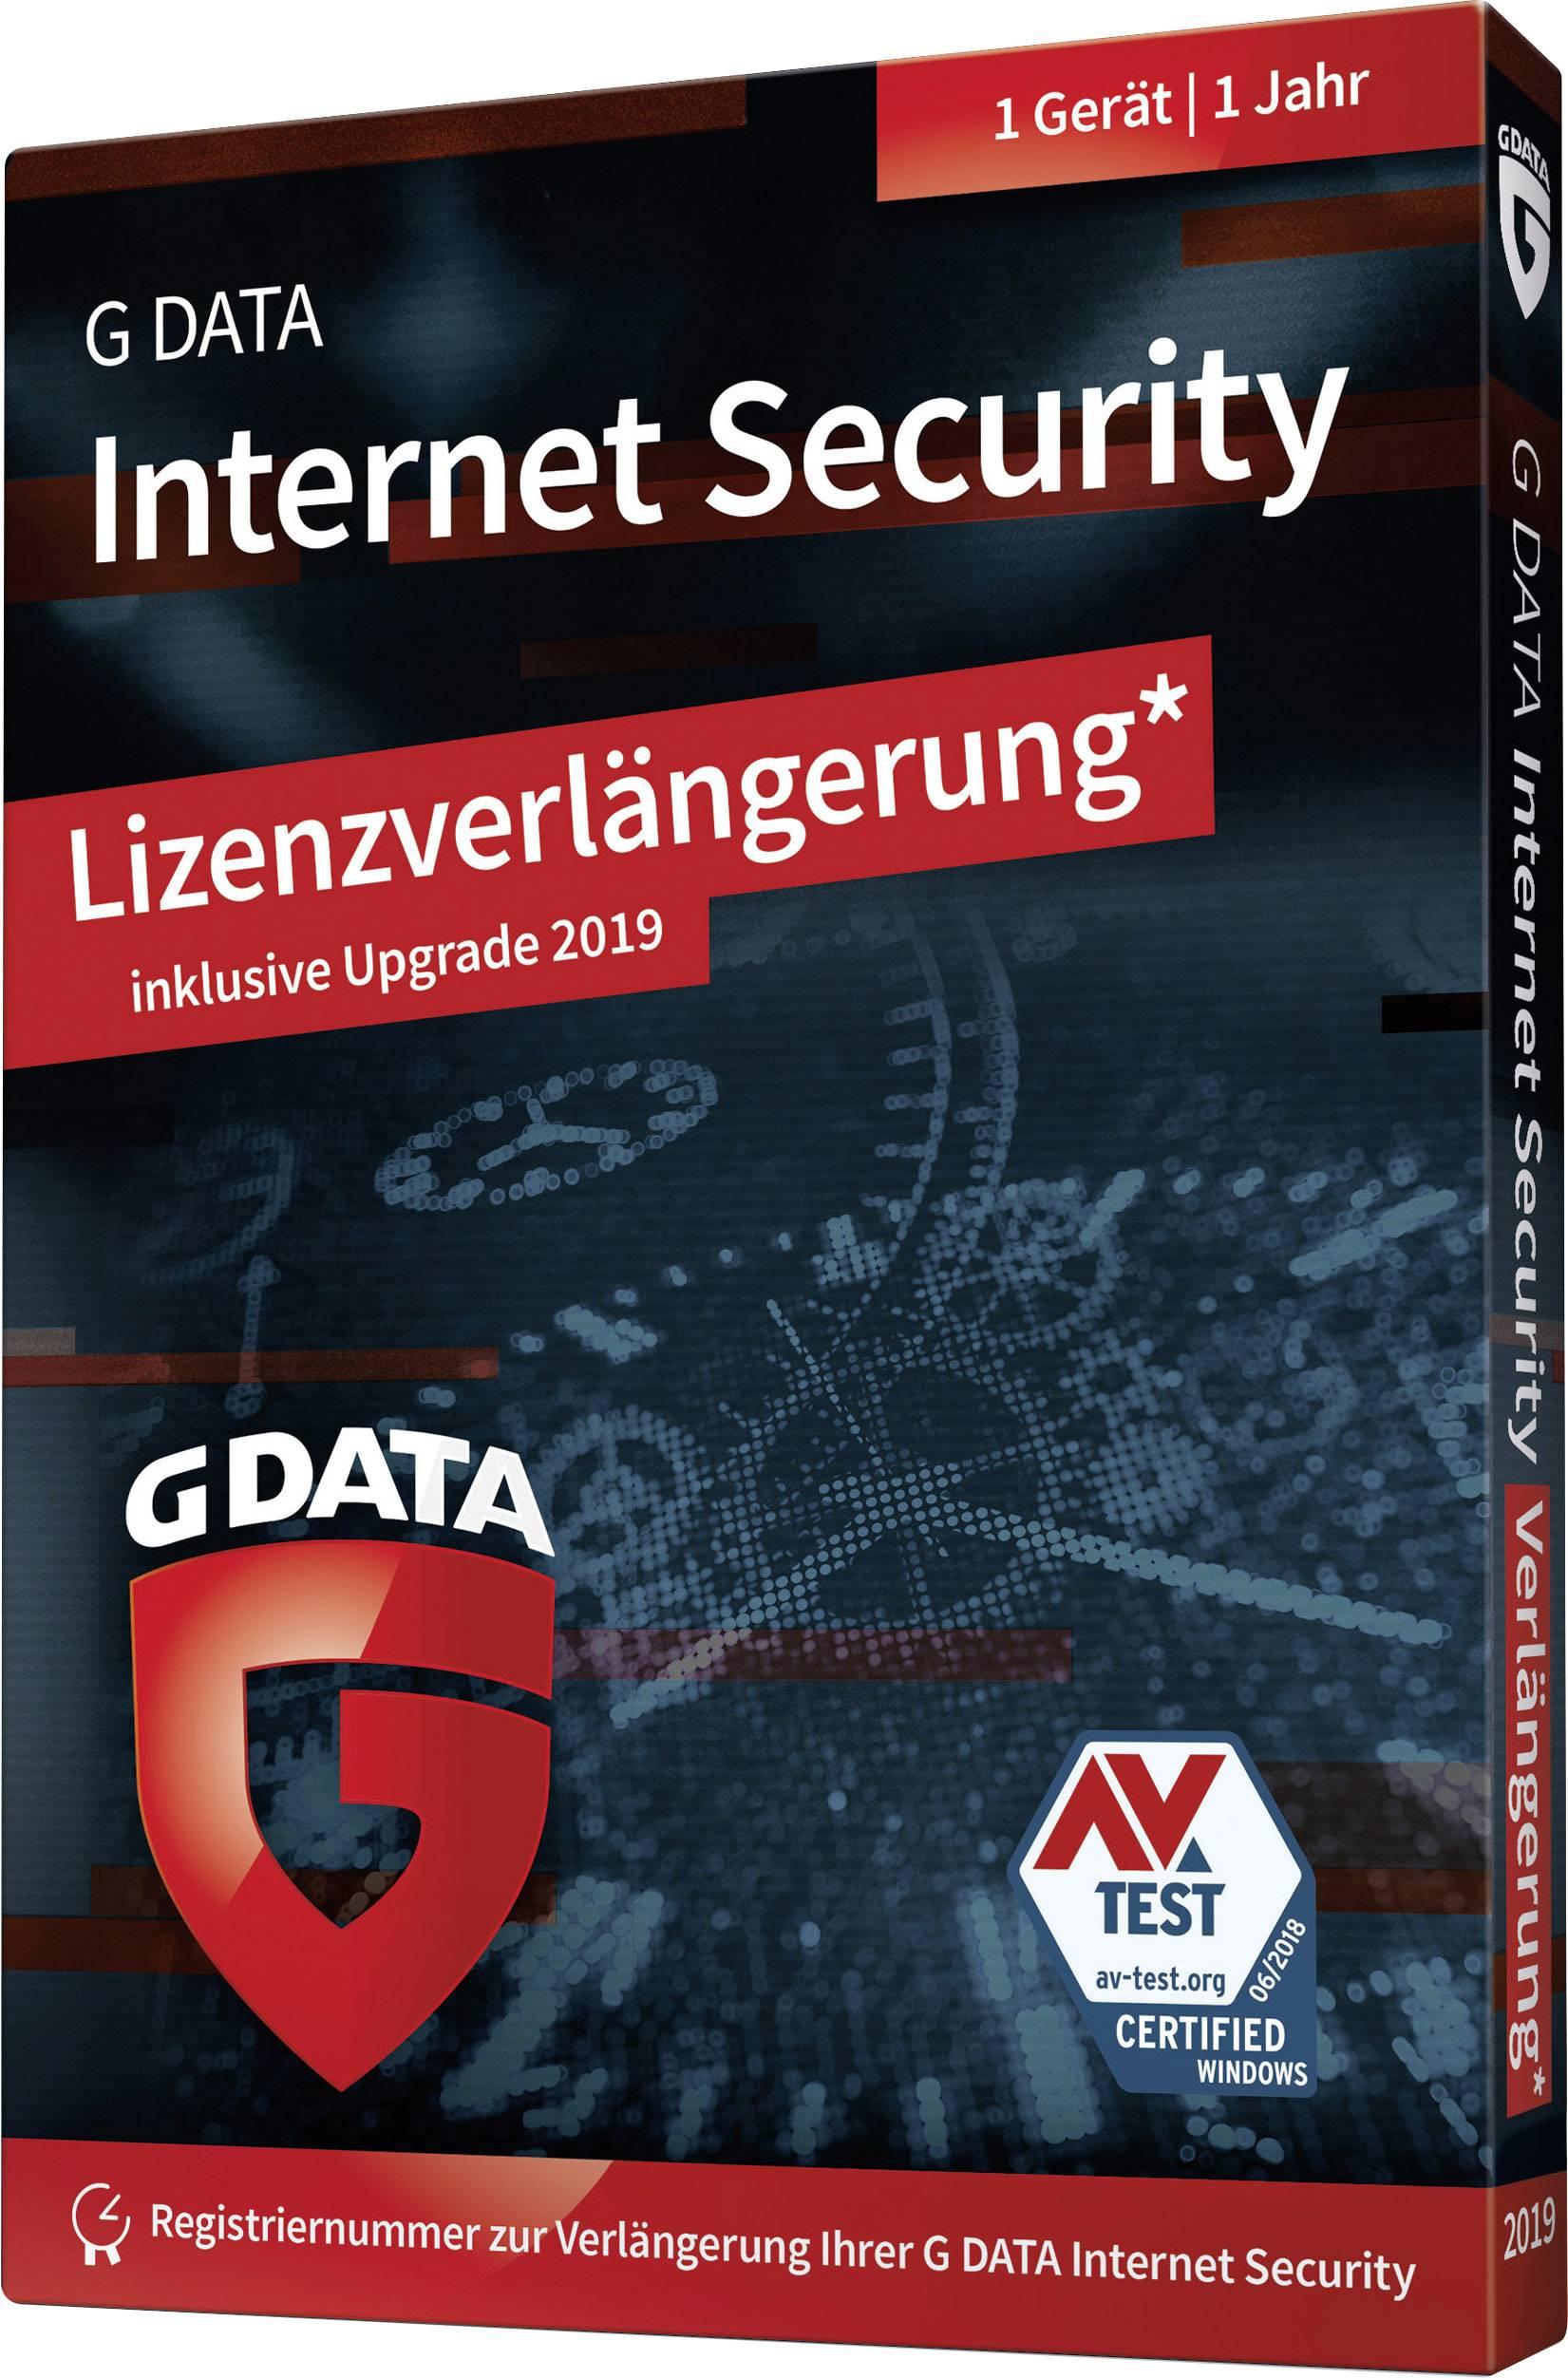 G-Data Internet Security 2019 Upgrade, 1 license Windows Antivirus